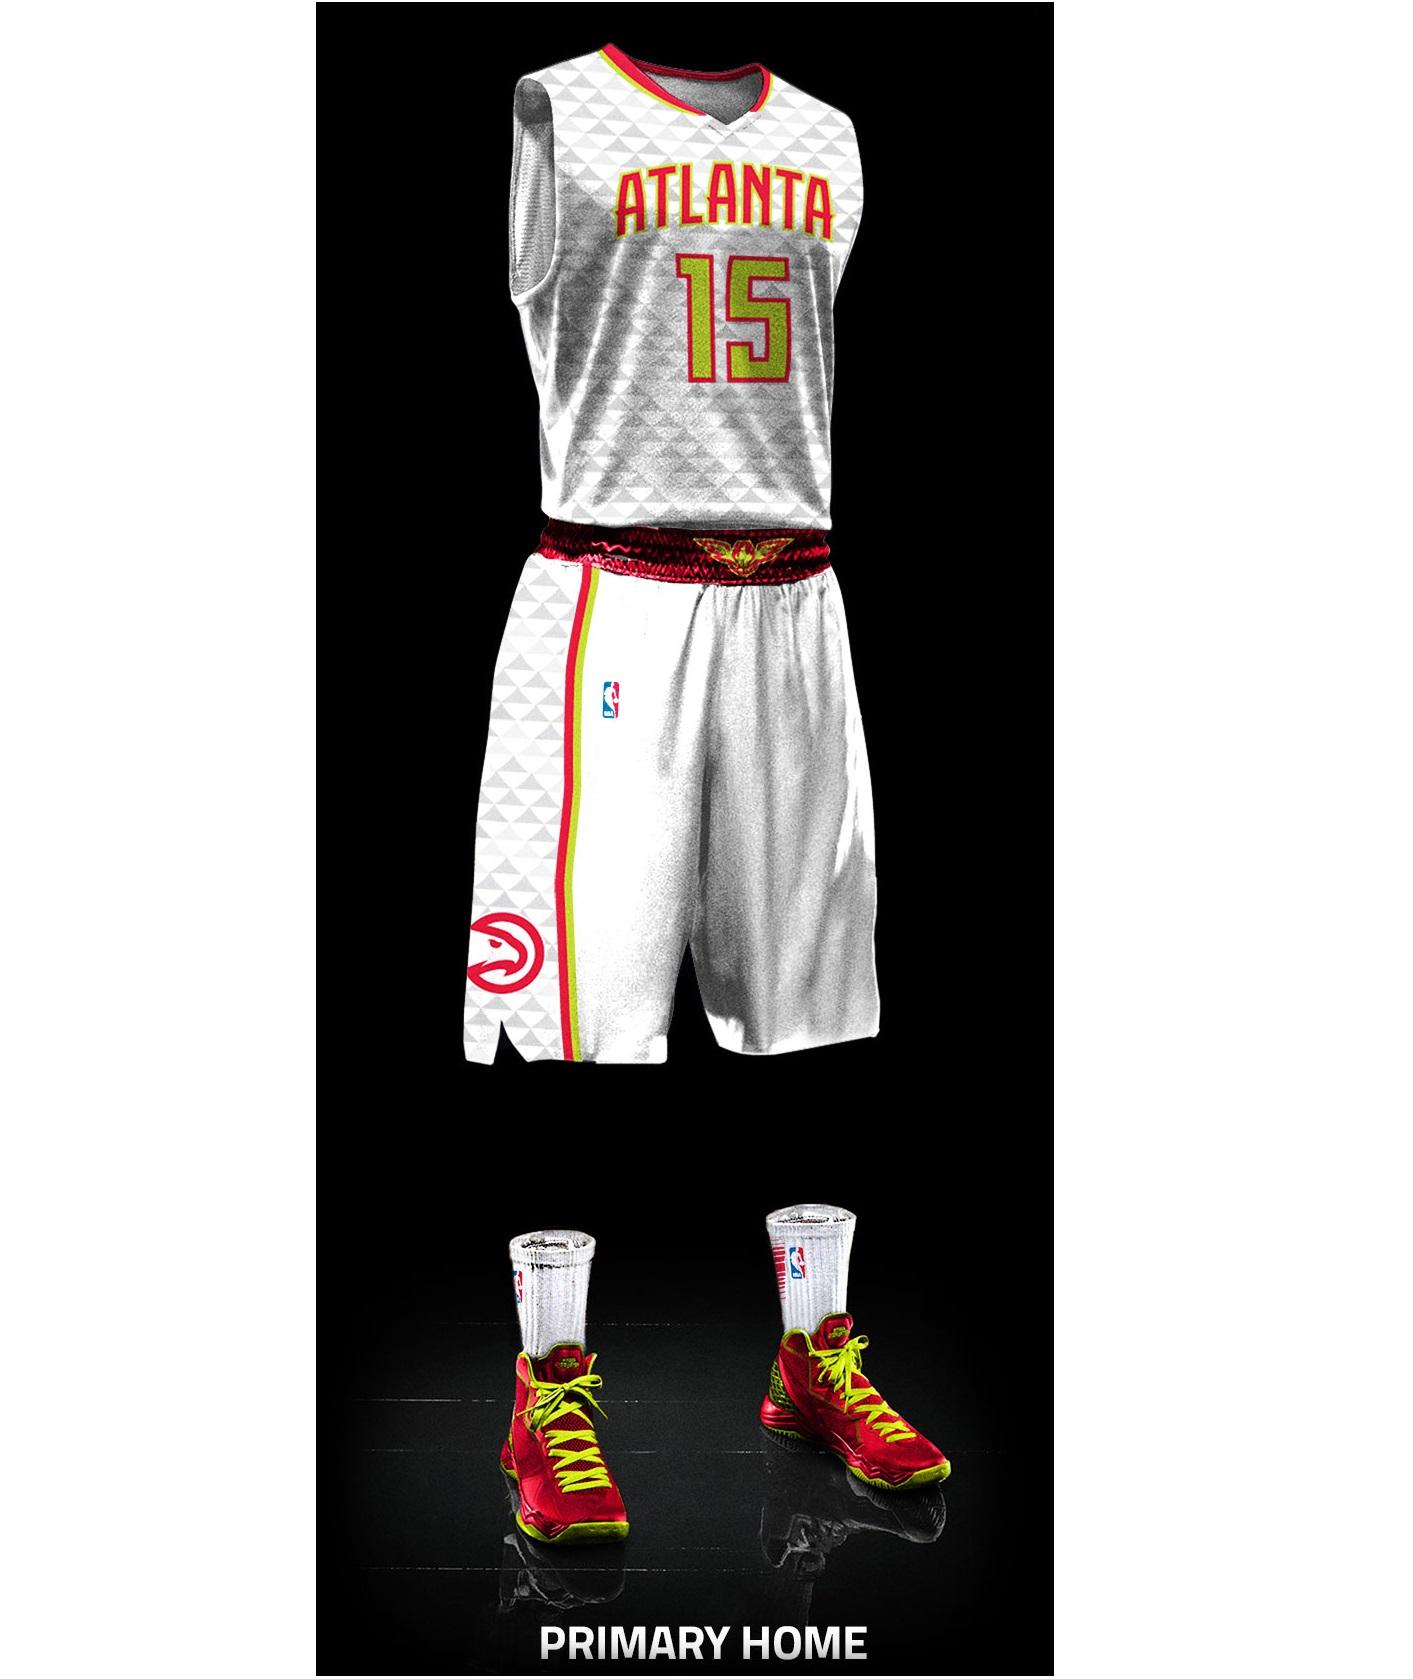 Atlanta Hawks - Home jersey